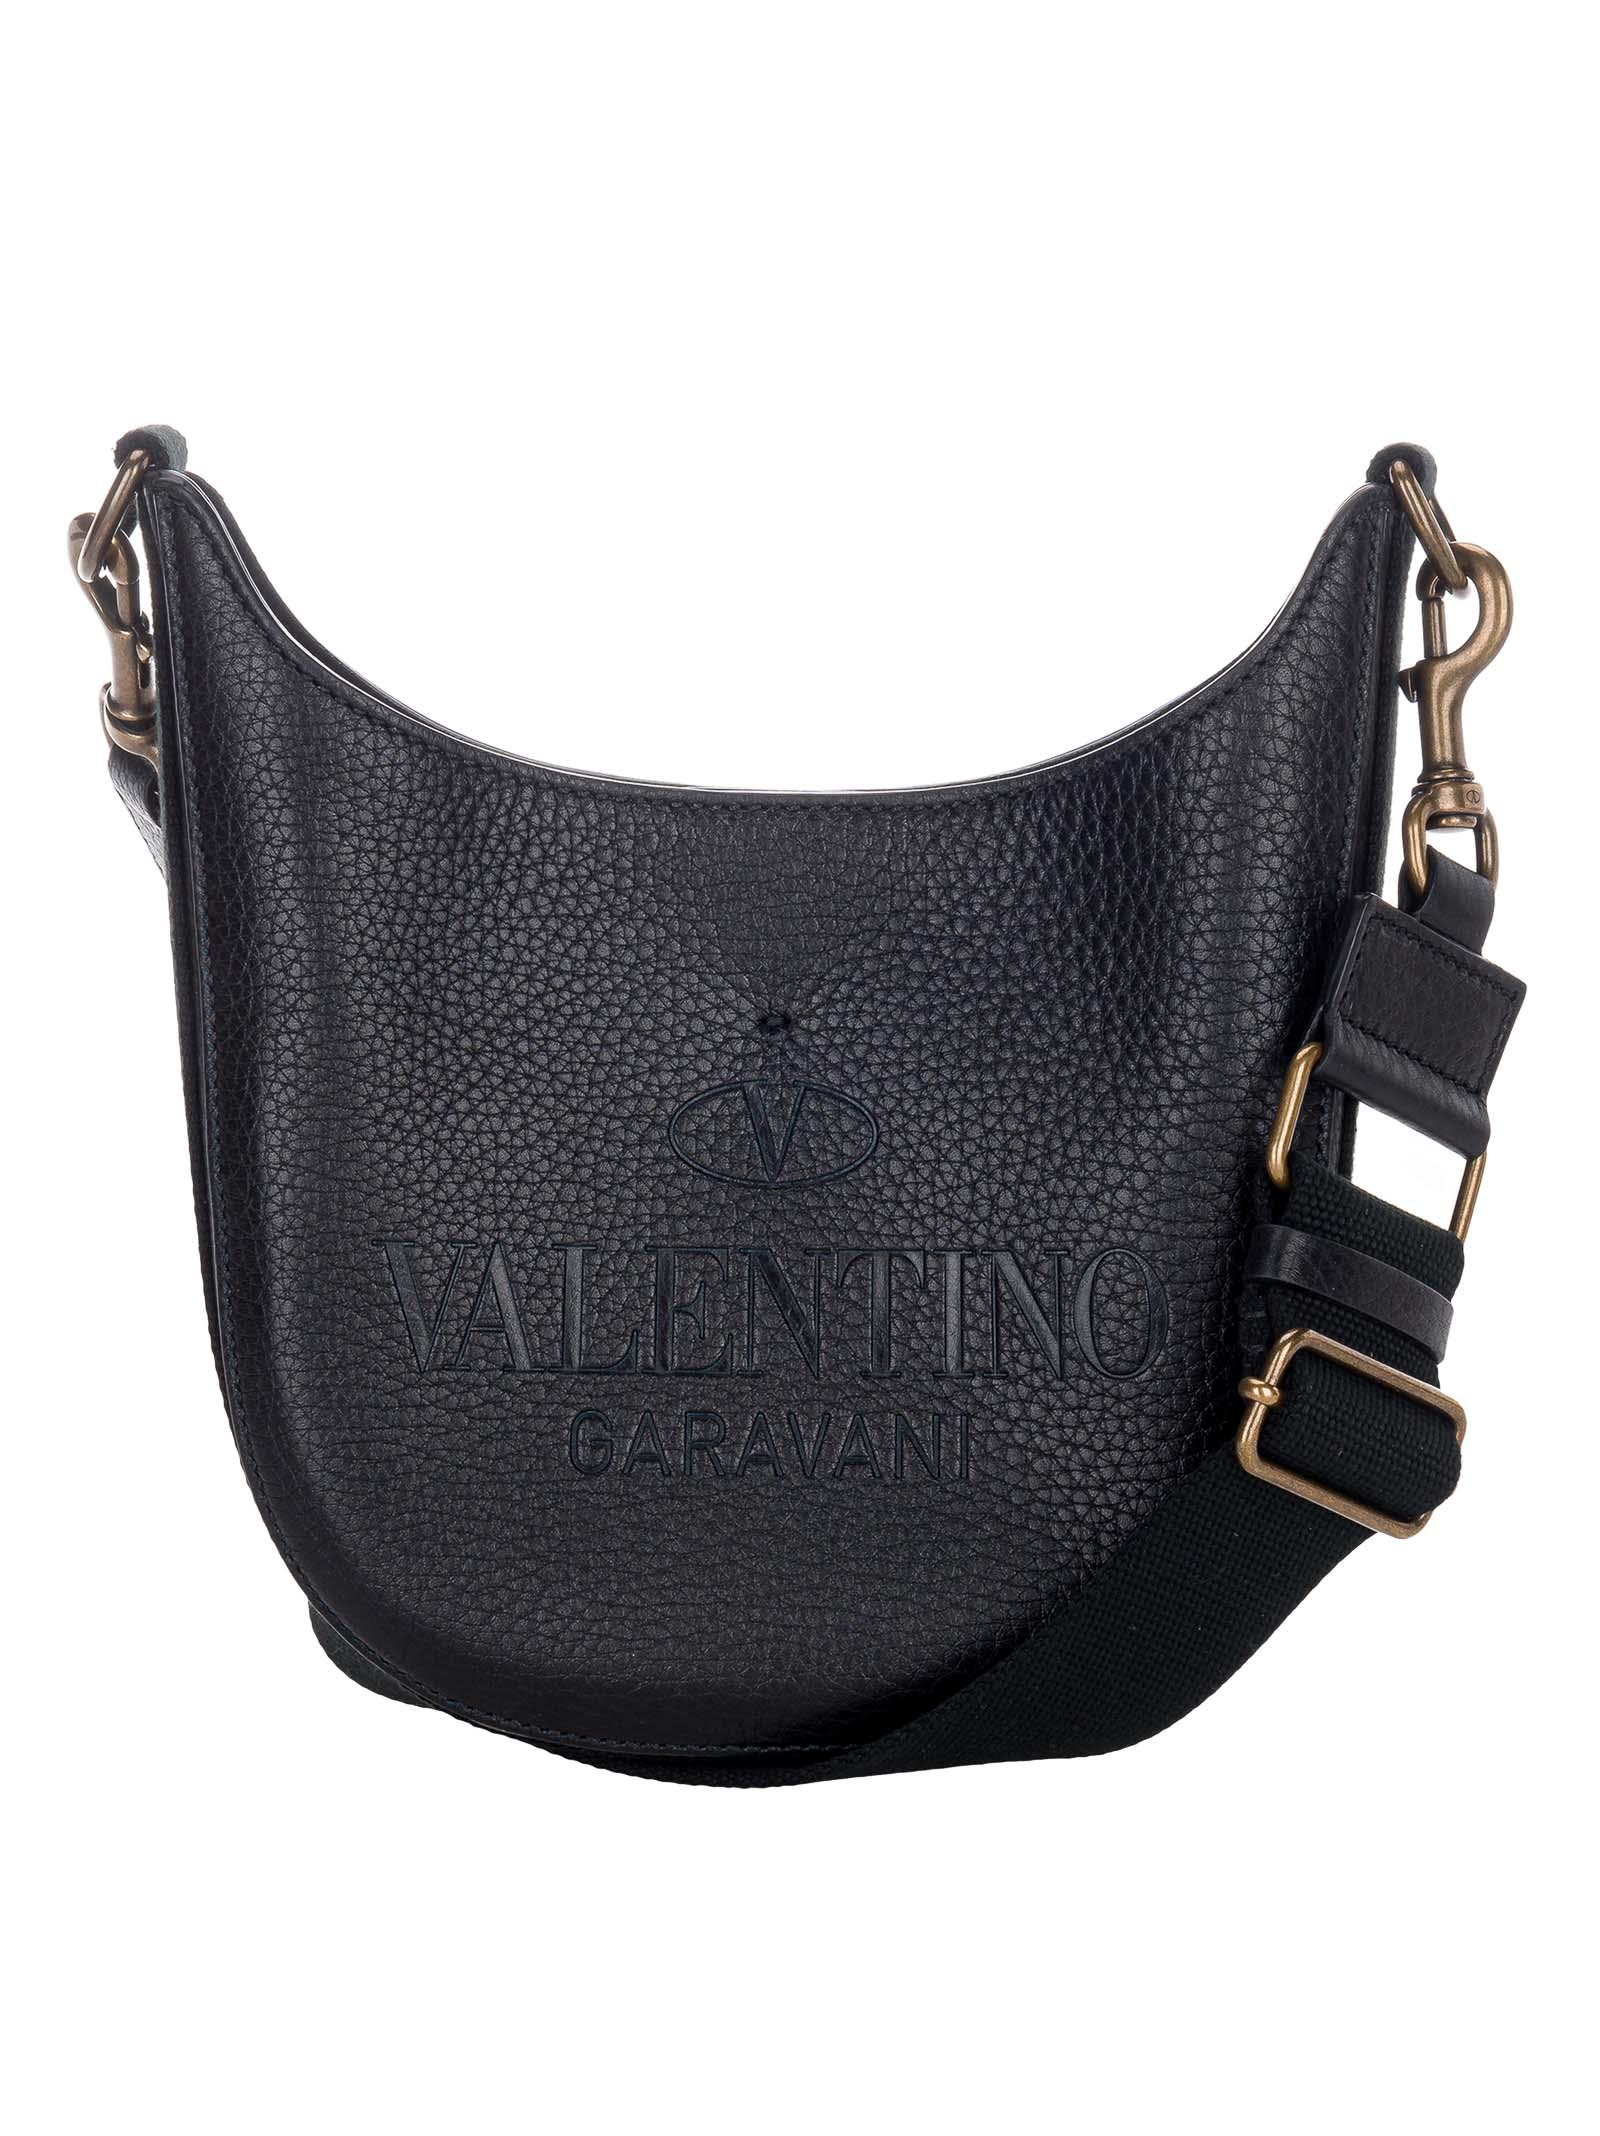 VALENTINO SMALL HOBO IDENTITY BAG